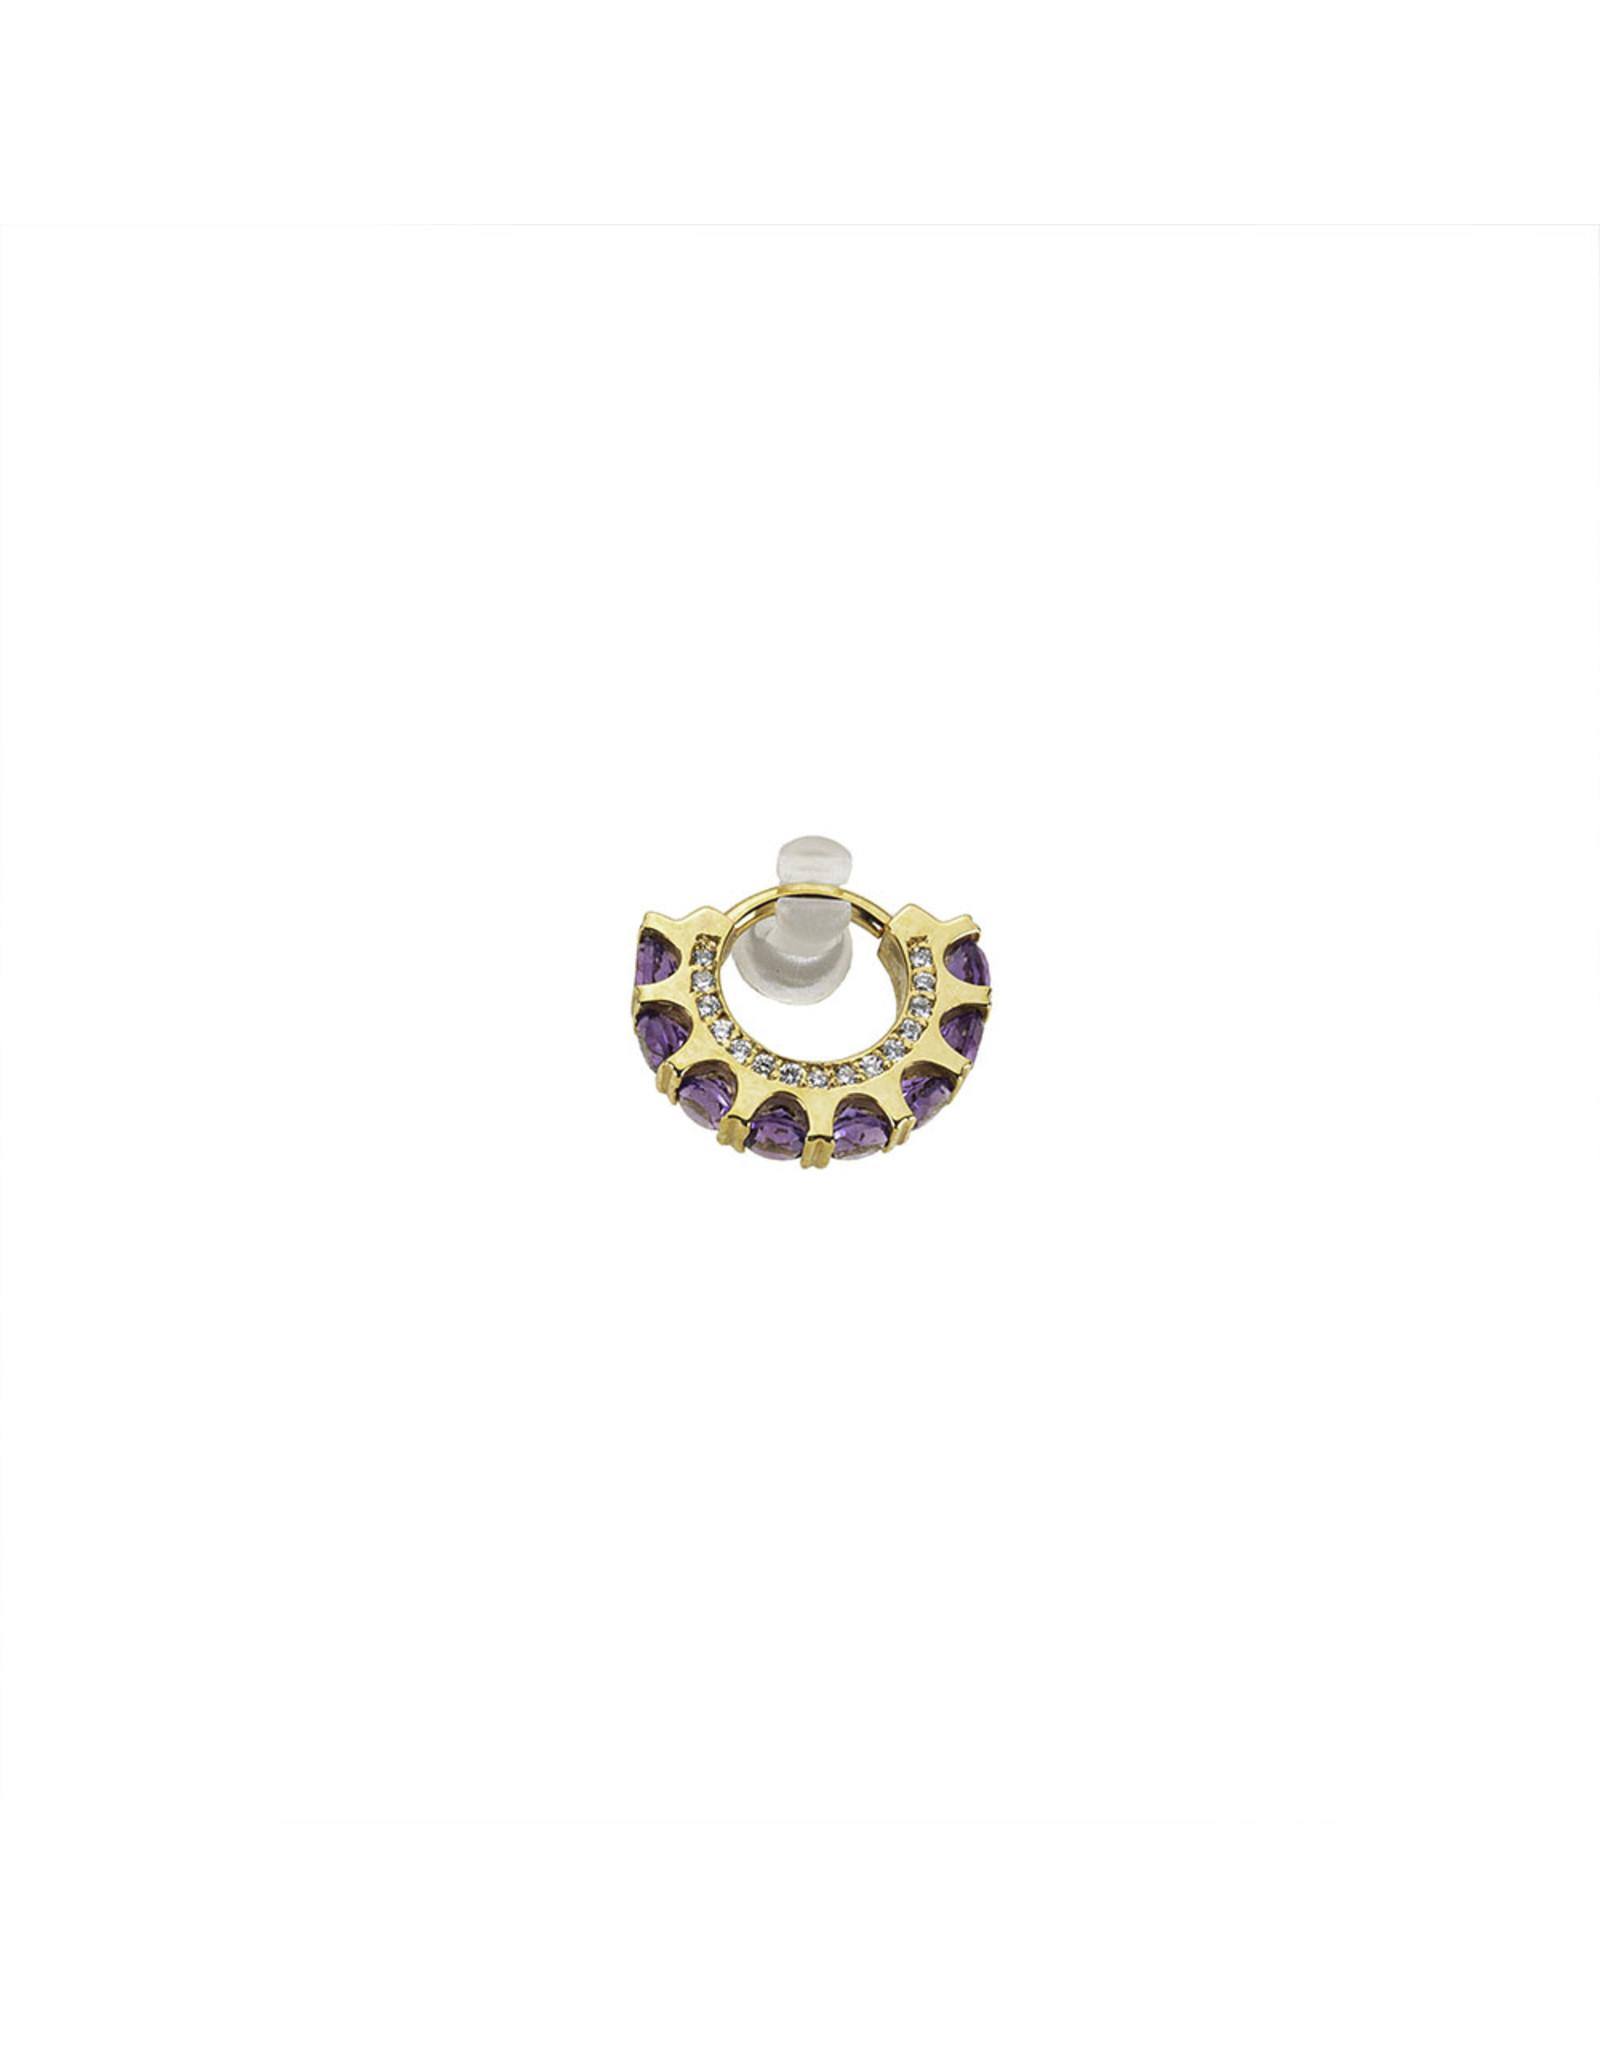 "BVLA BVLA 16g 5/16 rose gold ""Cirrus"" clicker with 8x 3.0 amethyst and 13x 1.0 VS1 diamonds"